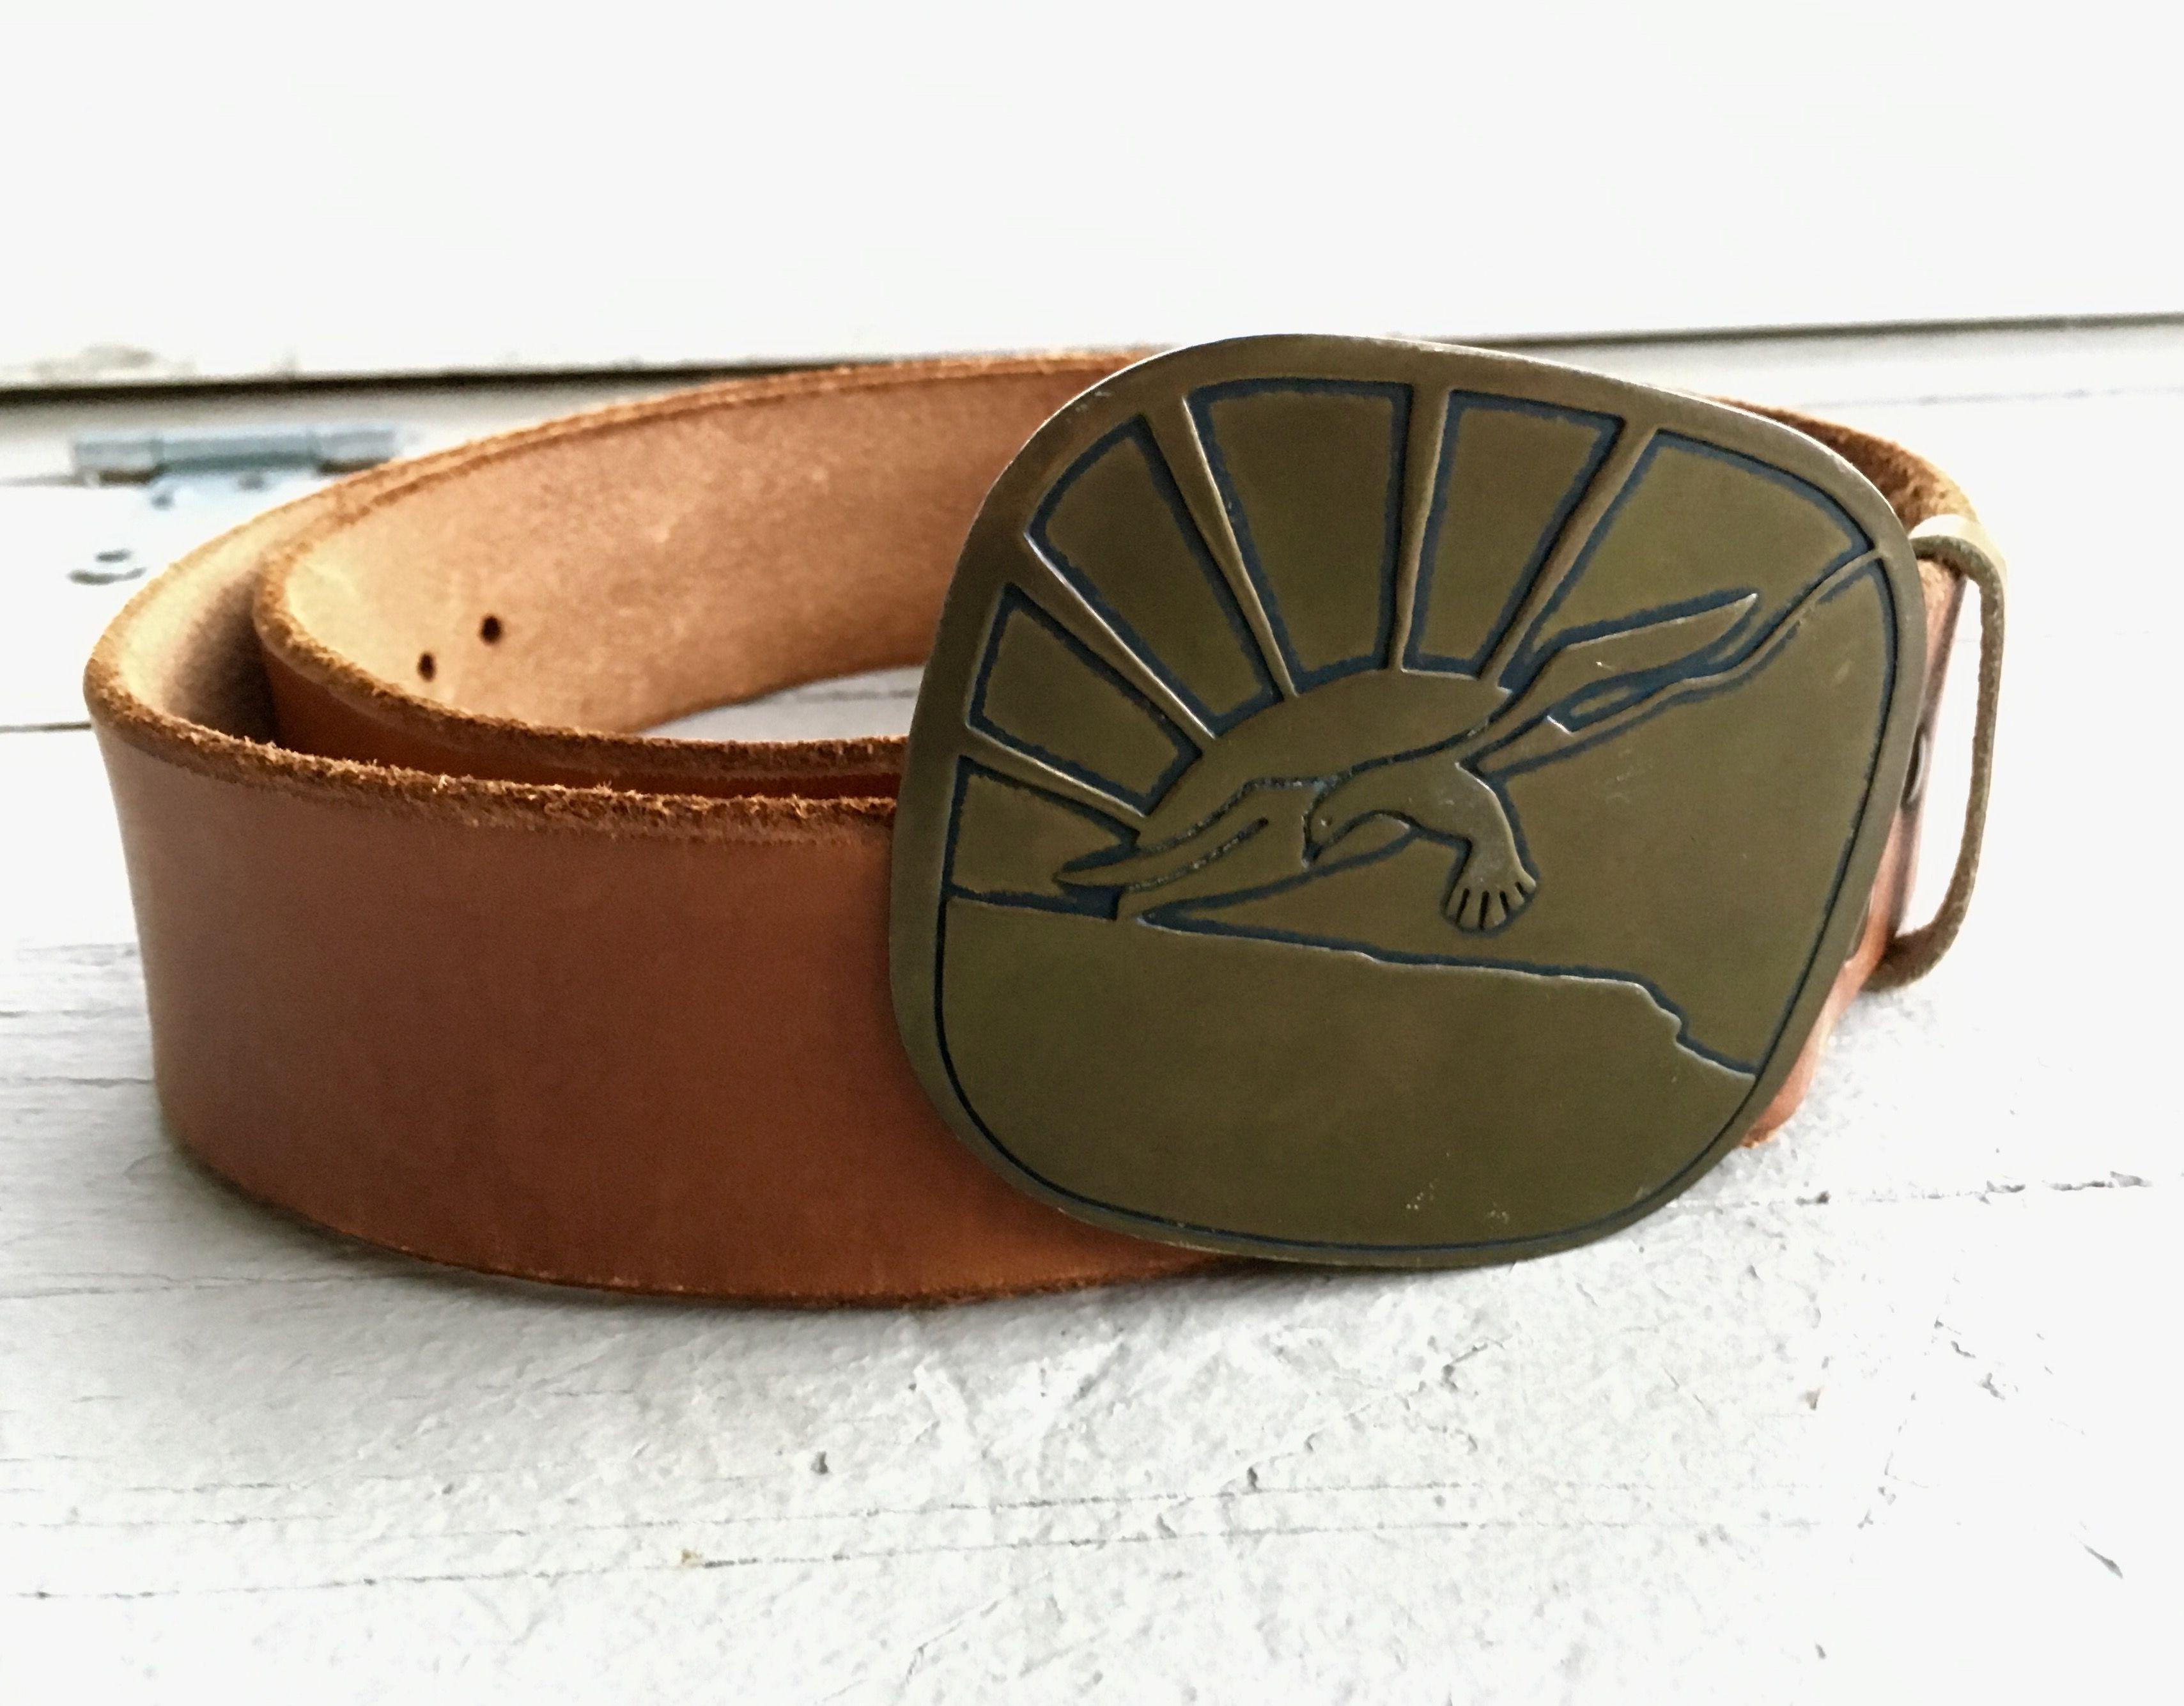 Vintage 70s Belt Buckle Belt Retro Cool Belt Buckle Fashion Seagull And Sunrise Accessories Available In My Etsy Shop Belt Buckles Accessories Etsy Shop